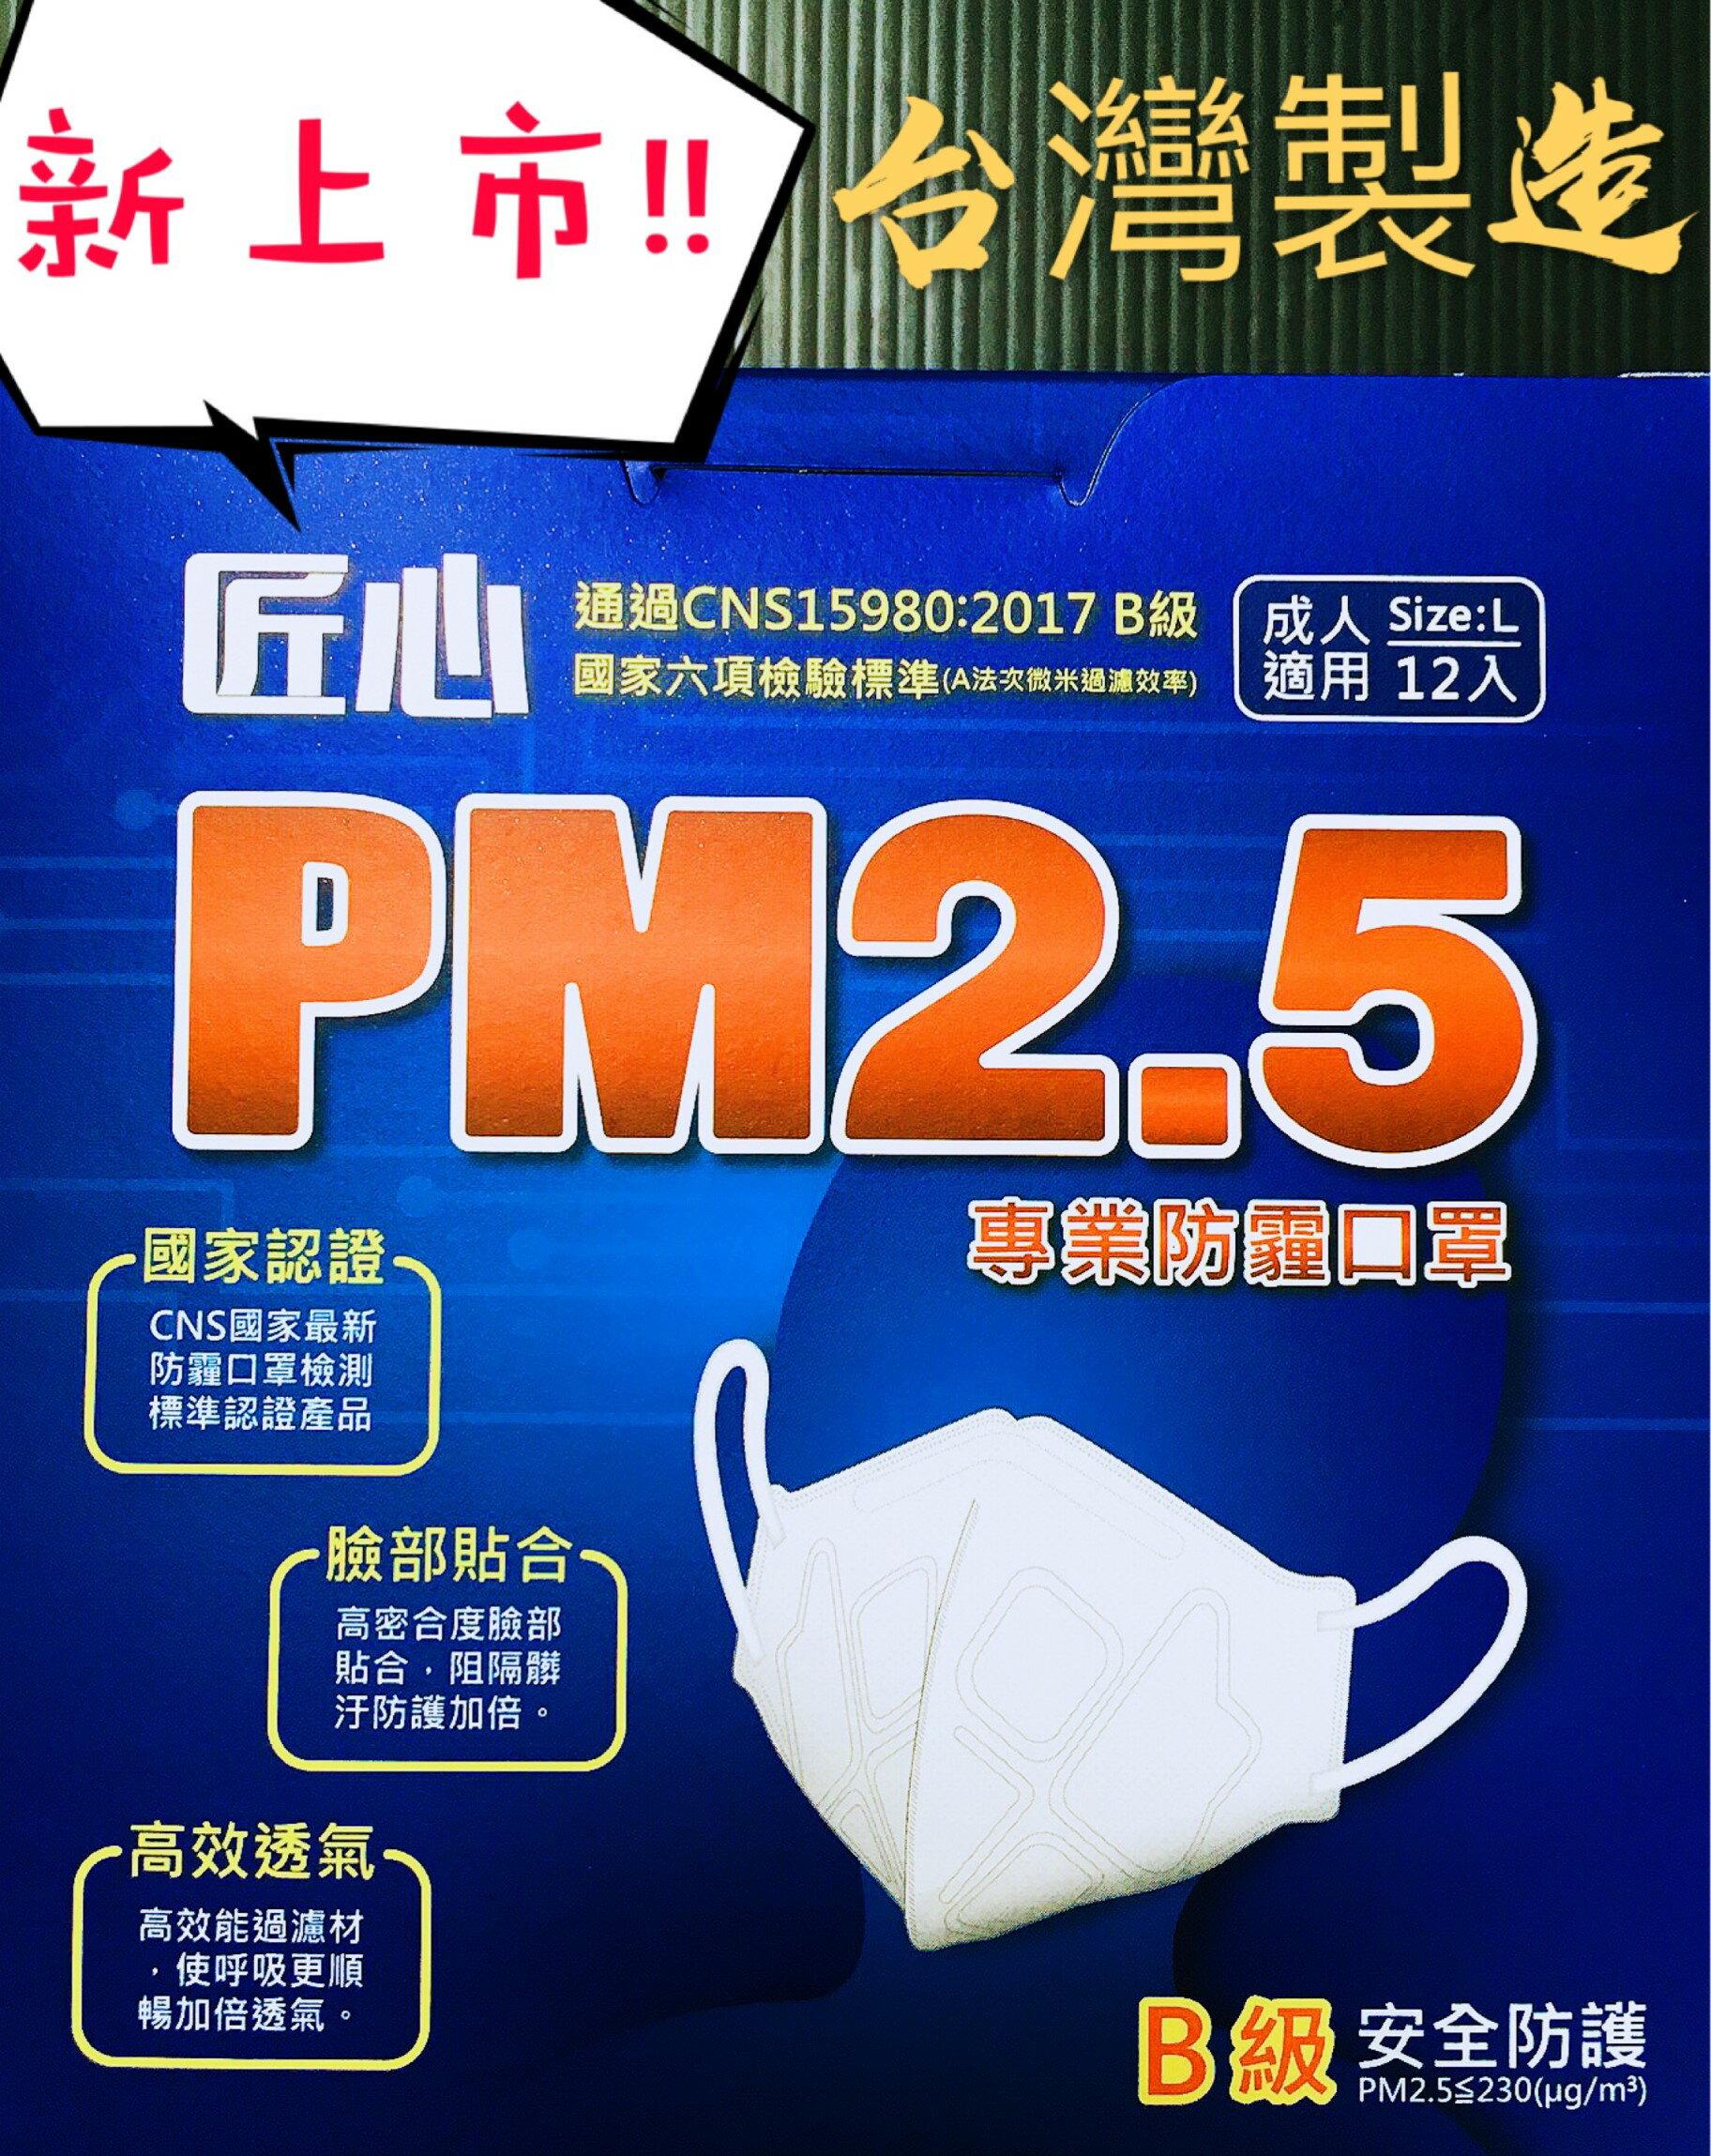 【MG】新上市 匠心PM2.5口罩 專業防霧霾口罩 通過國家檢驗B級防霾口罩